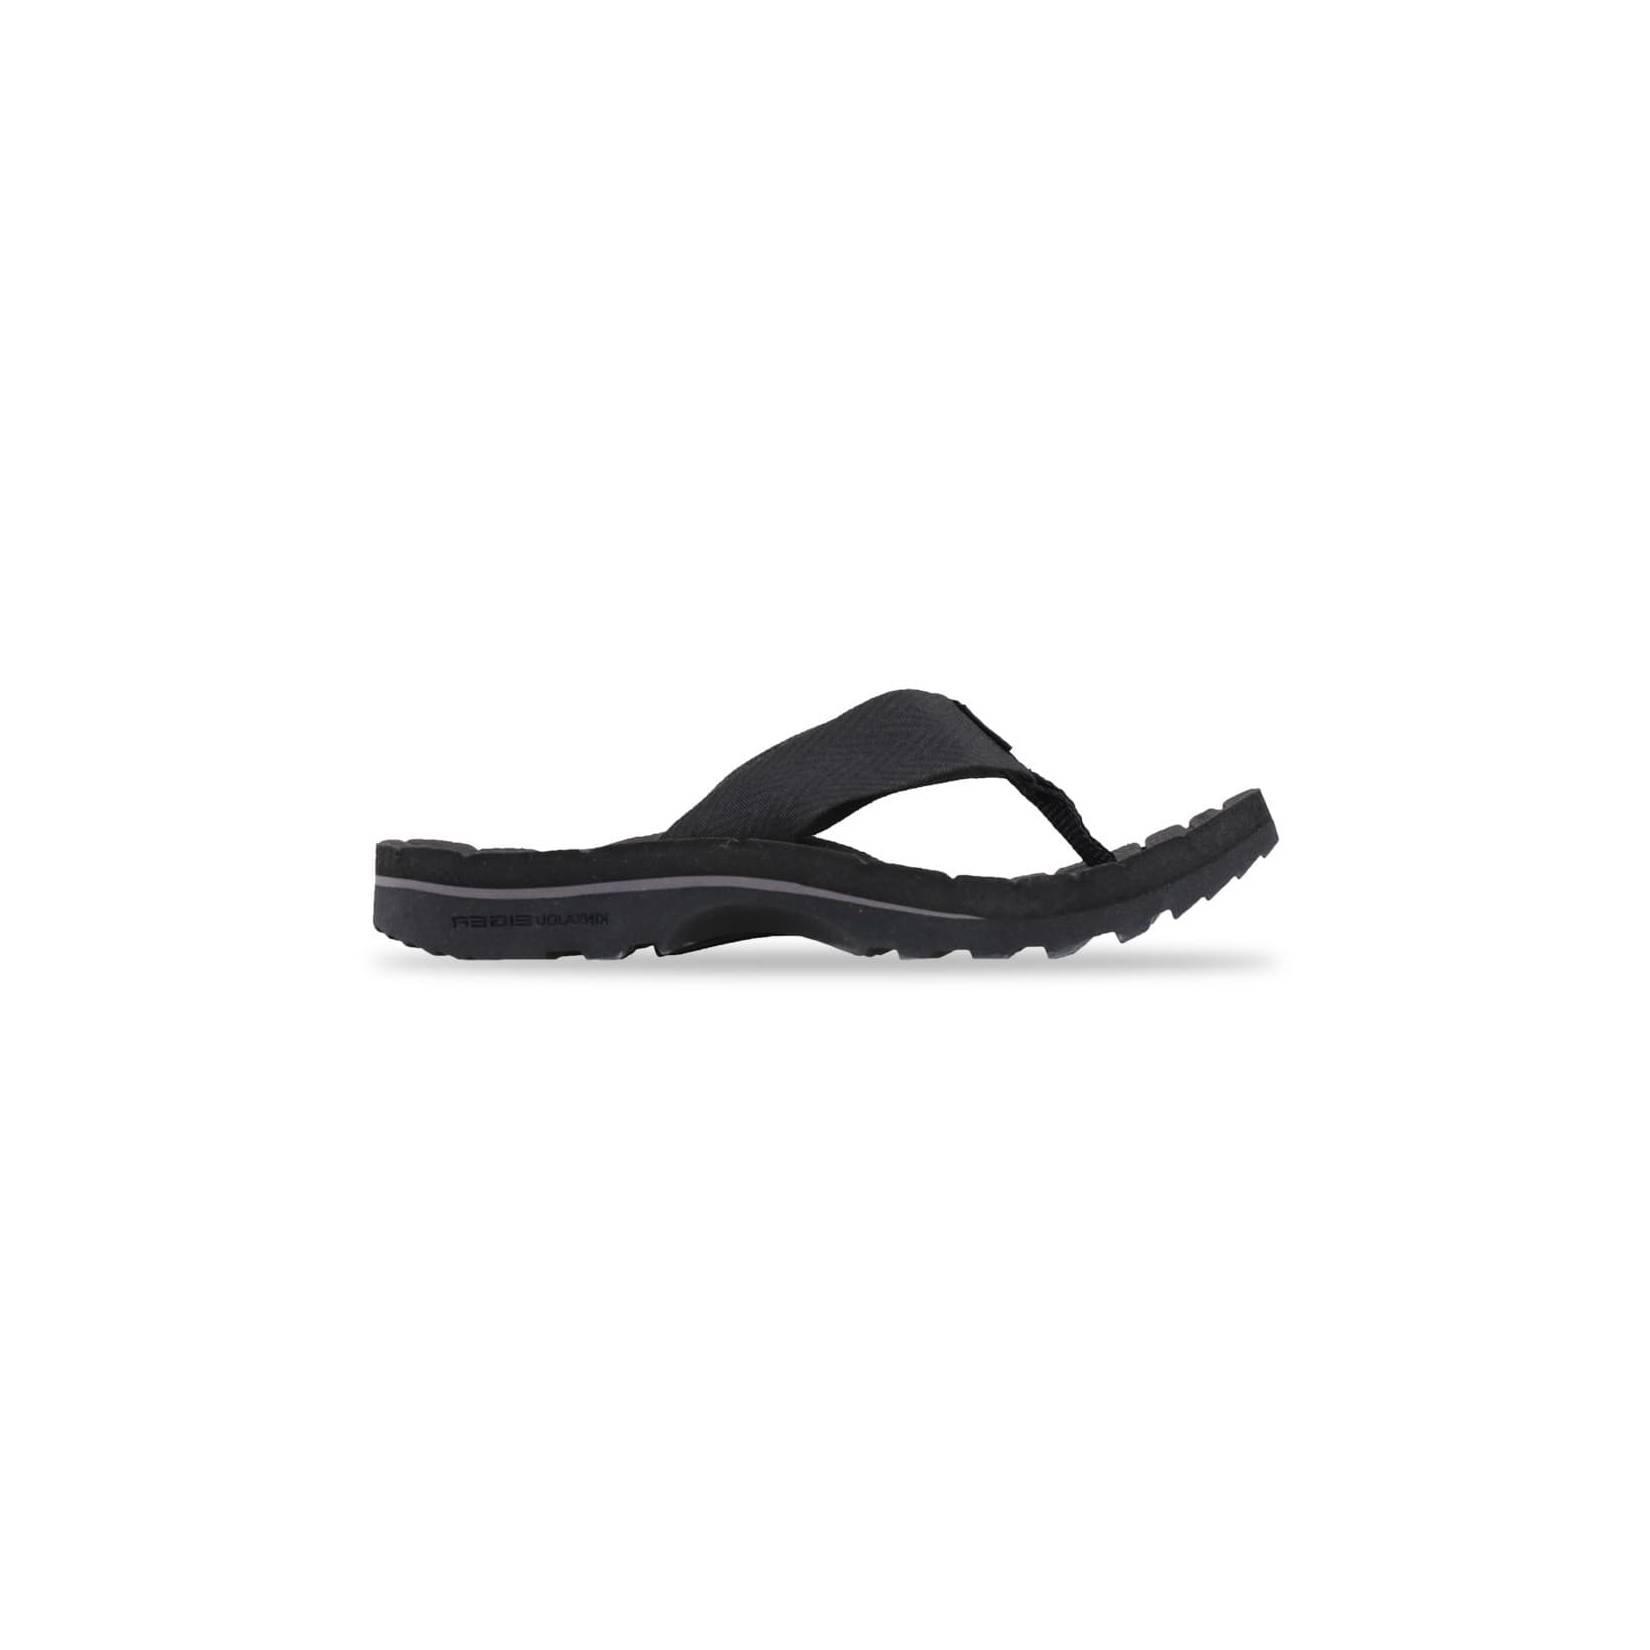 Sandal Jepit Gunung Eiger Kinkajou / Sandal Gunung Original 100 %